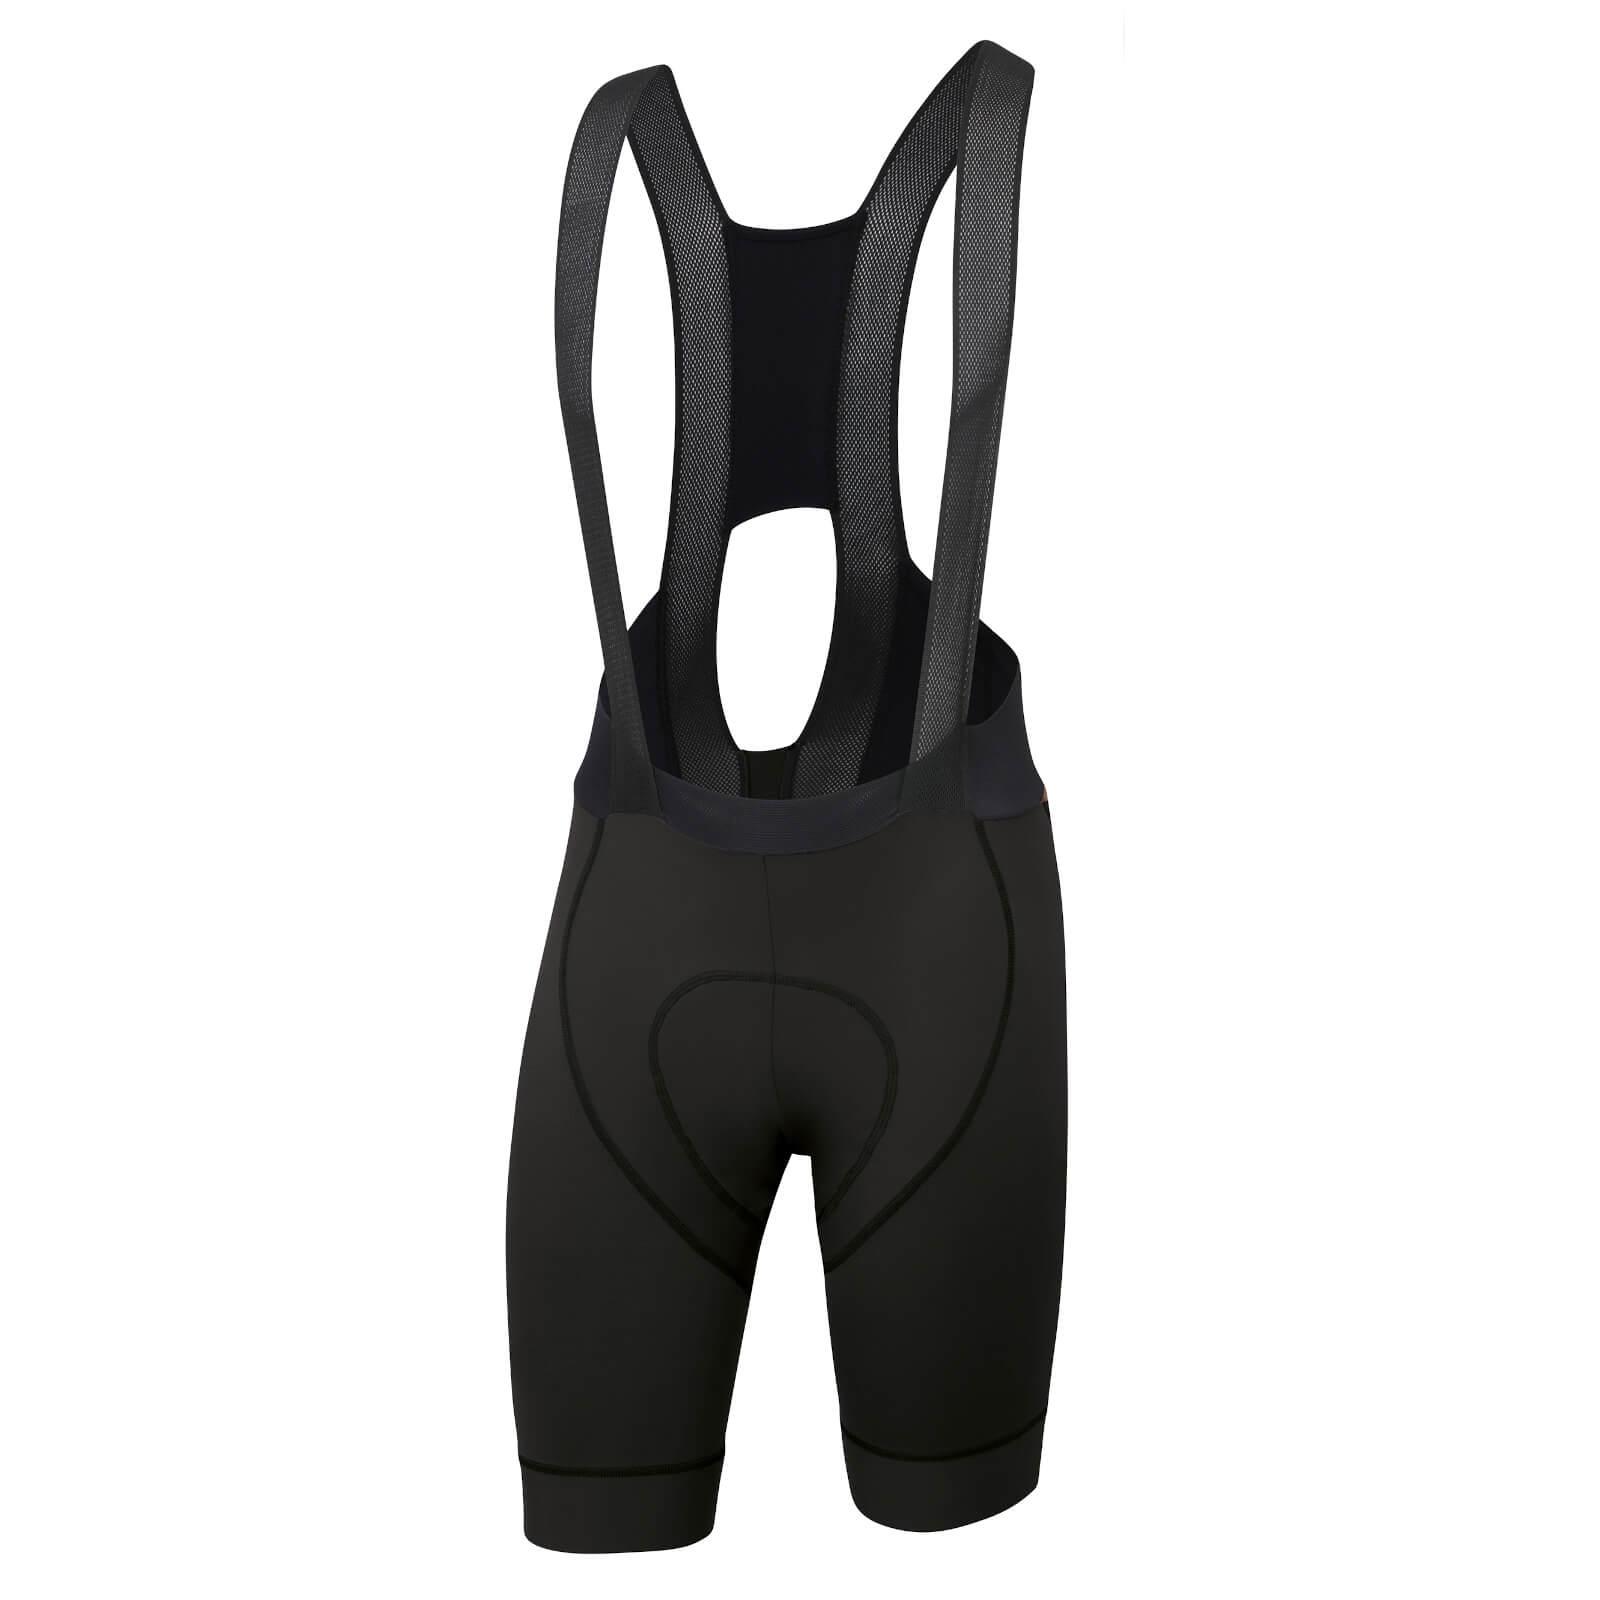 Sportful BodyFit Pro LTD Bib Shorts - S - Schwarz